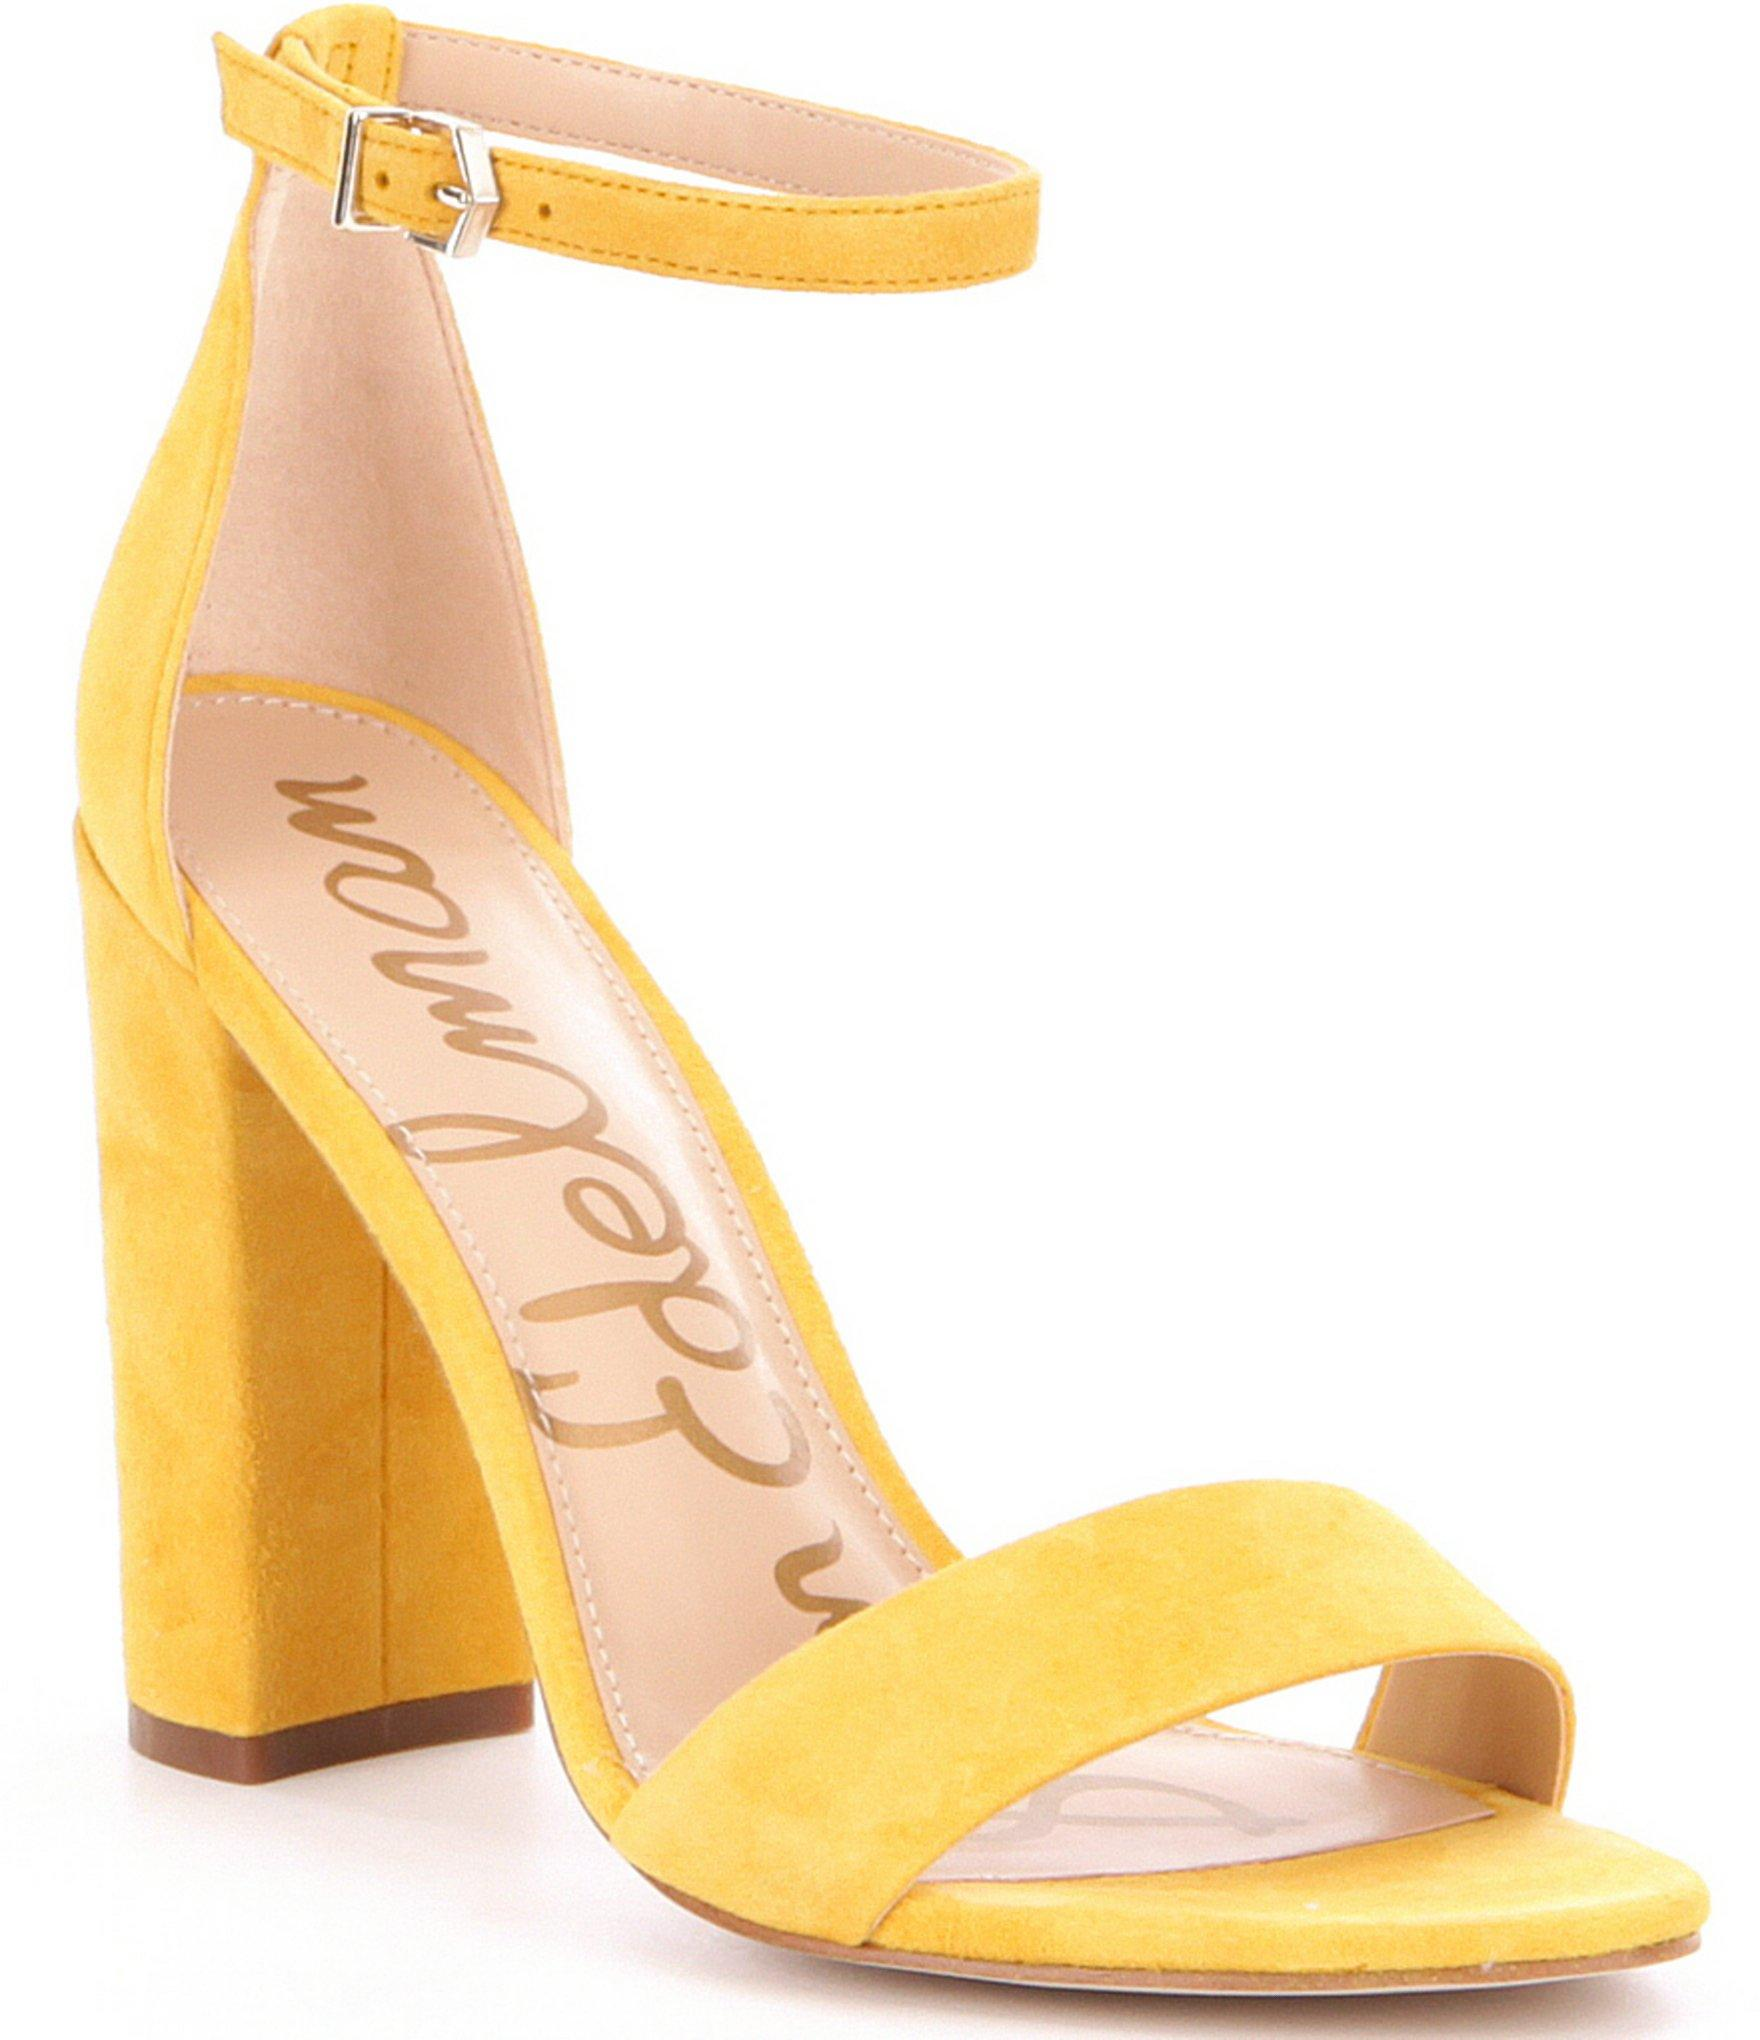 5f612d14761a Lyst - Sam Edelman Yaro Suede Block Heel Dress Sandals in Yellow